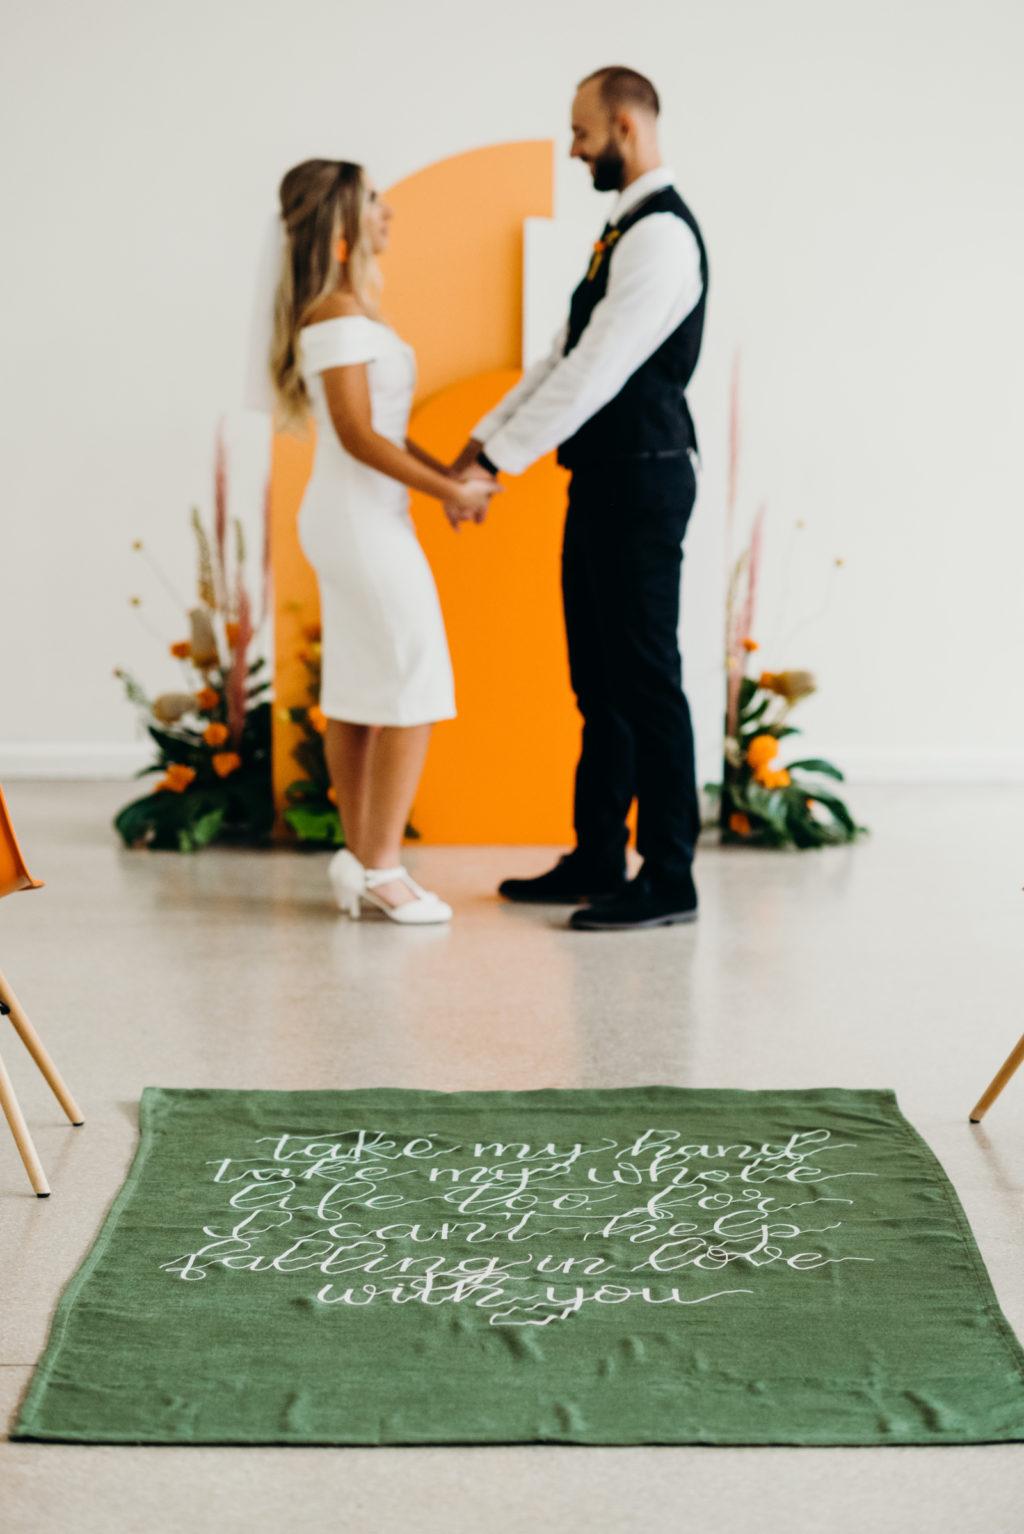 Retro Mid Century Wedding Ceremony Decor, Green Carpet Aisle Runner White Script Quote, Bride and Groom Exchanging Wedding Vows | Wedding Venue Tampa Garden Club